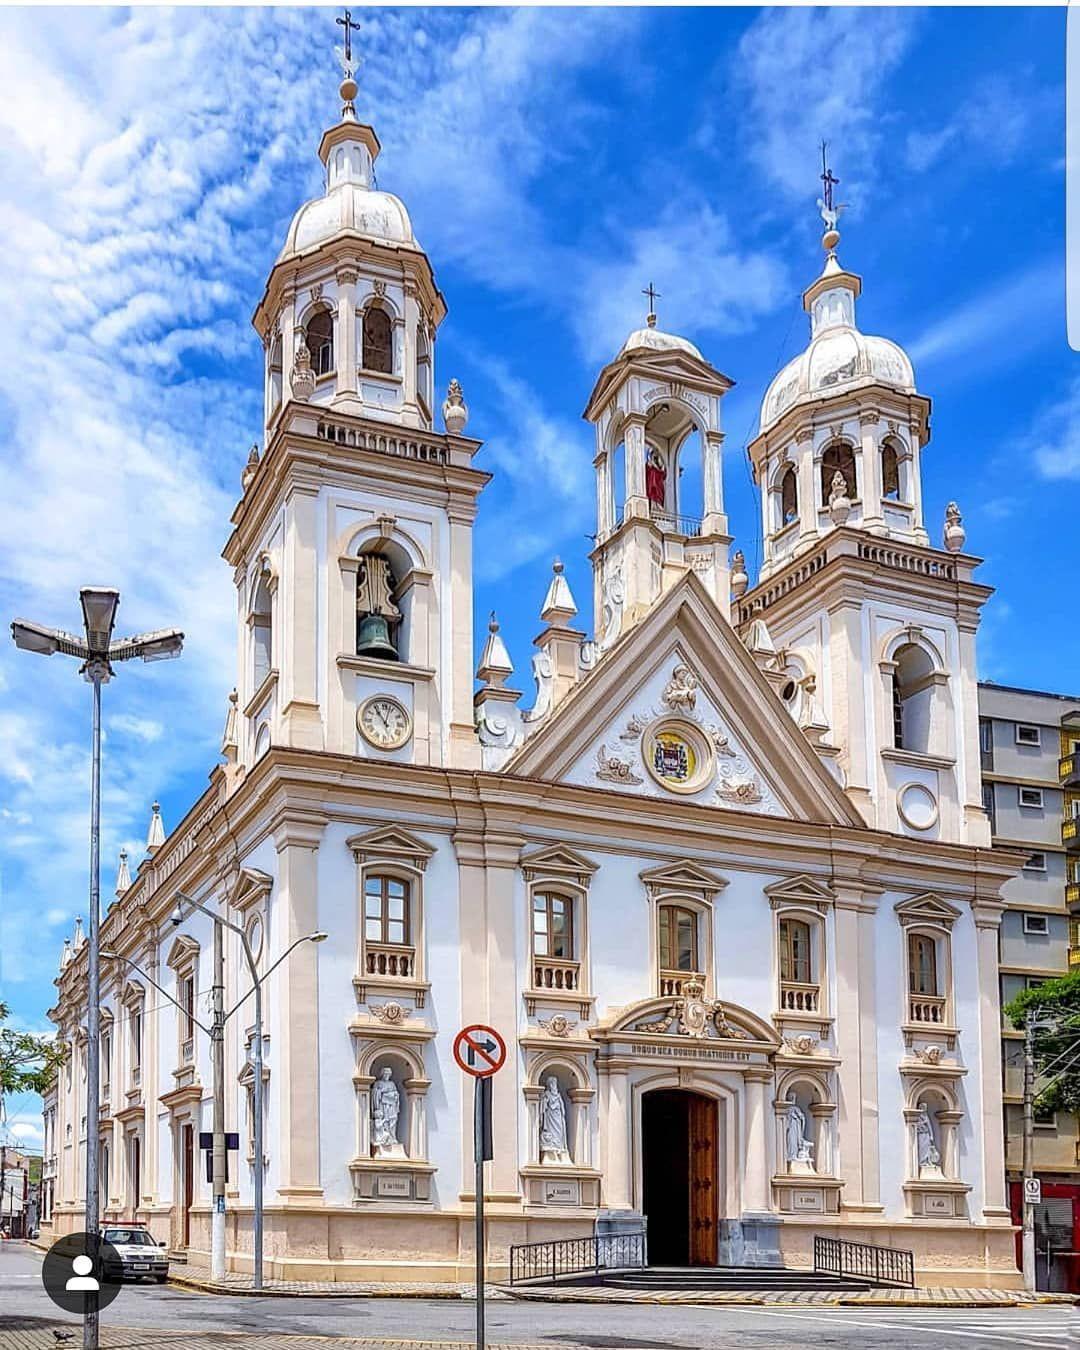 📷 Foto d | Igreja, Arquitetura de igreja, Arquitetura religiosa